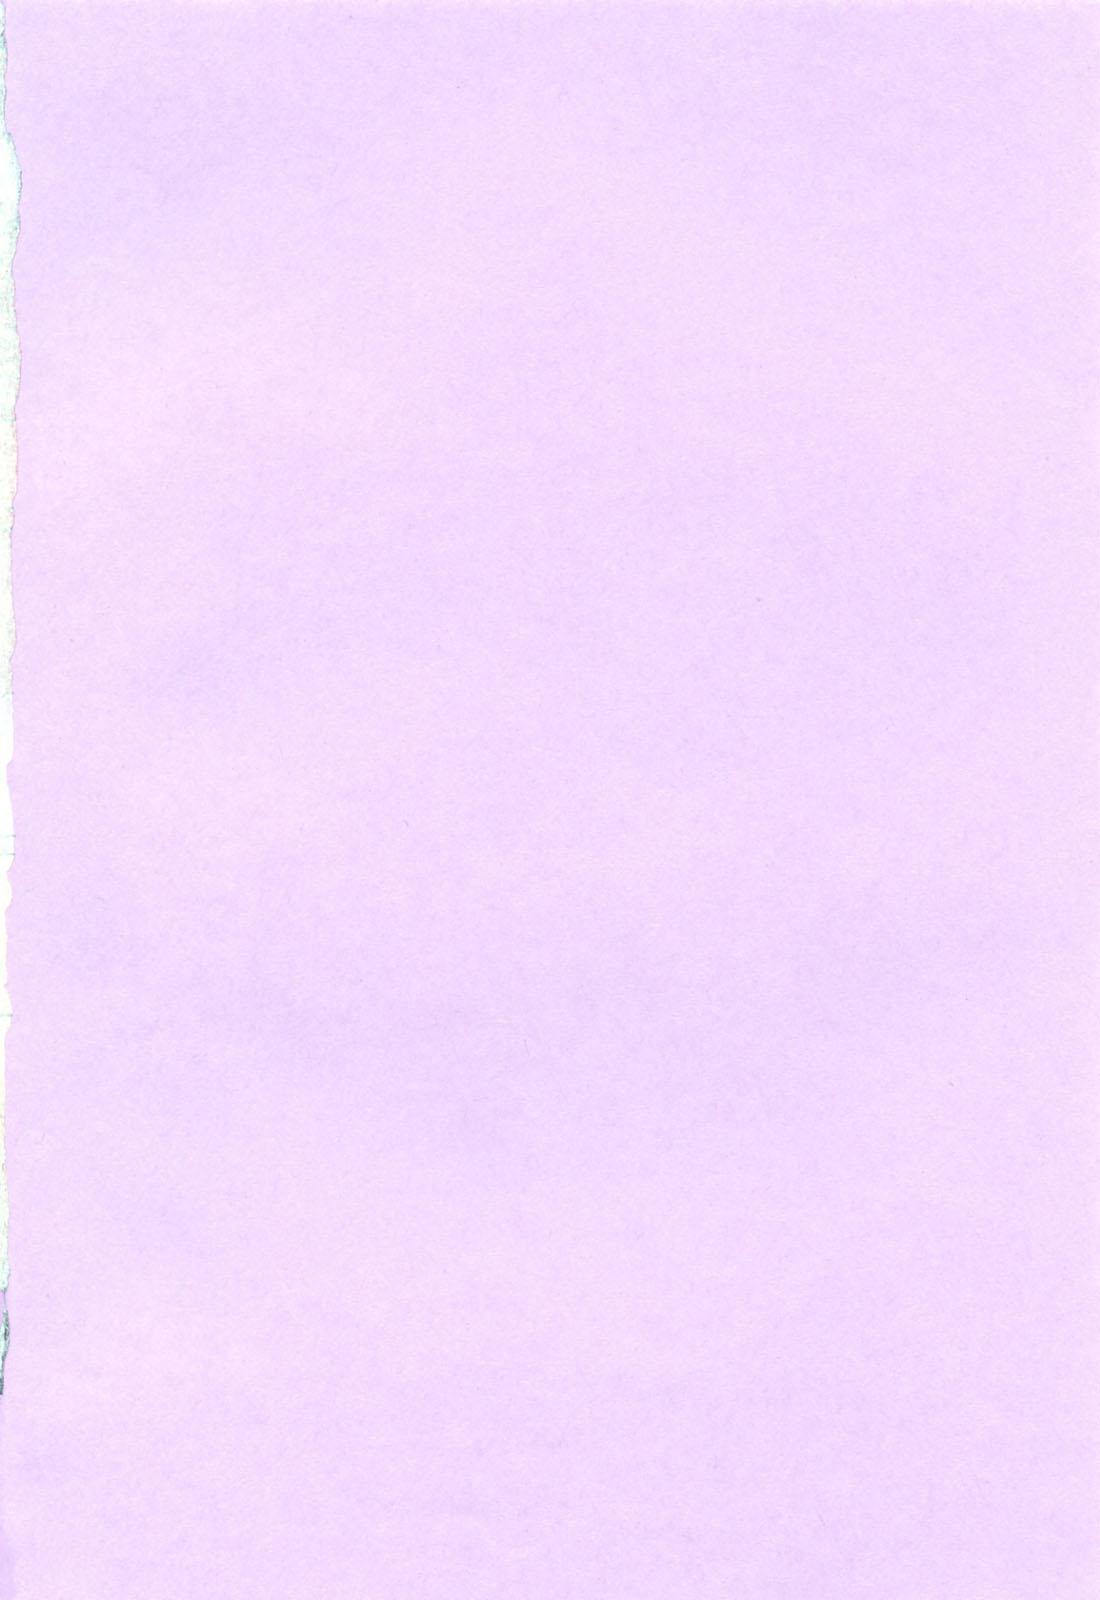 Kanjuku Hitozuma Nikki - The diary of the mature married woman 5